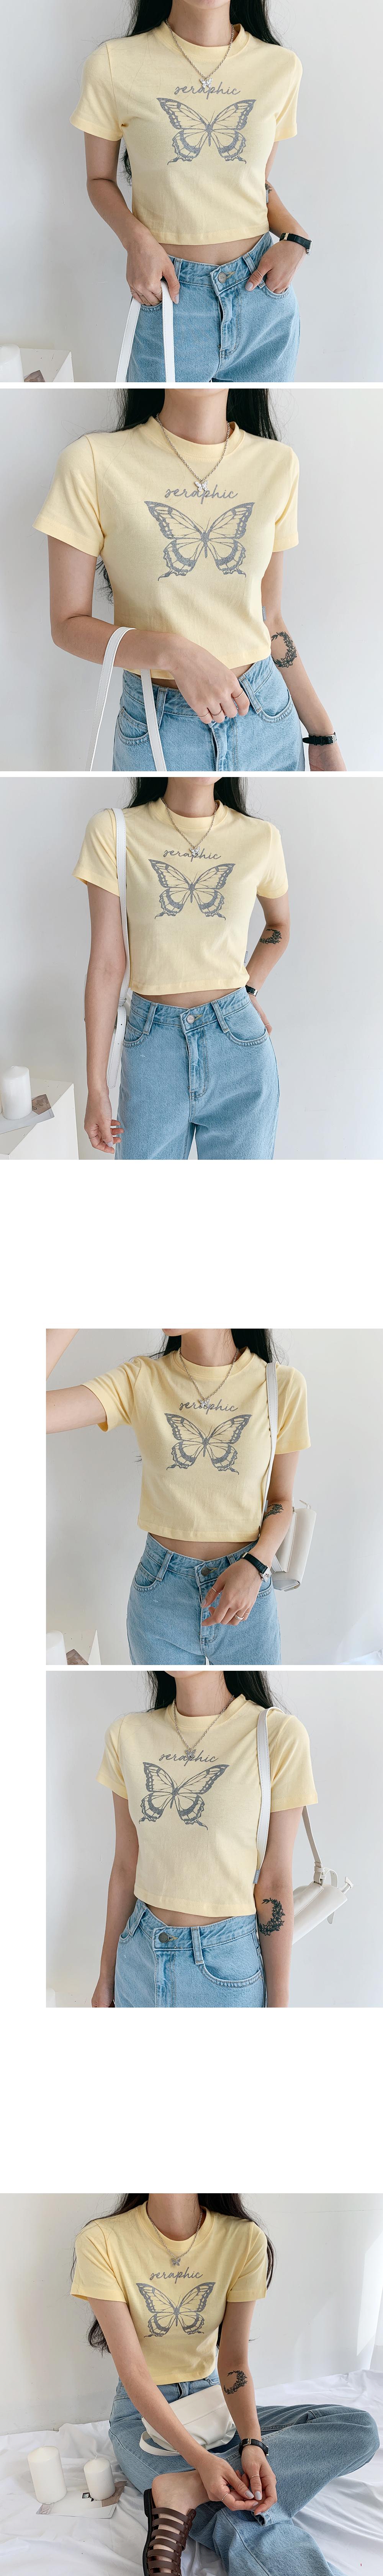 Butterfly Pearl Crop Short Sleeve Tee